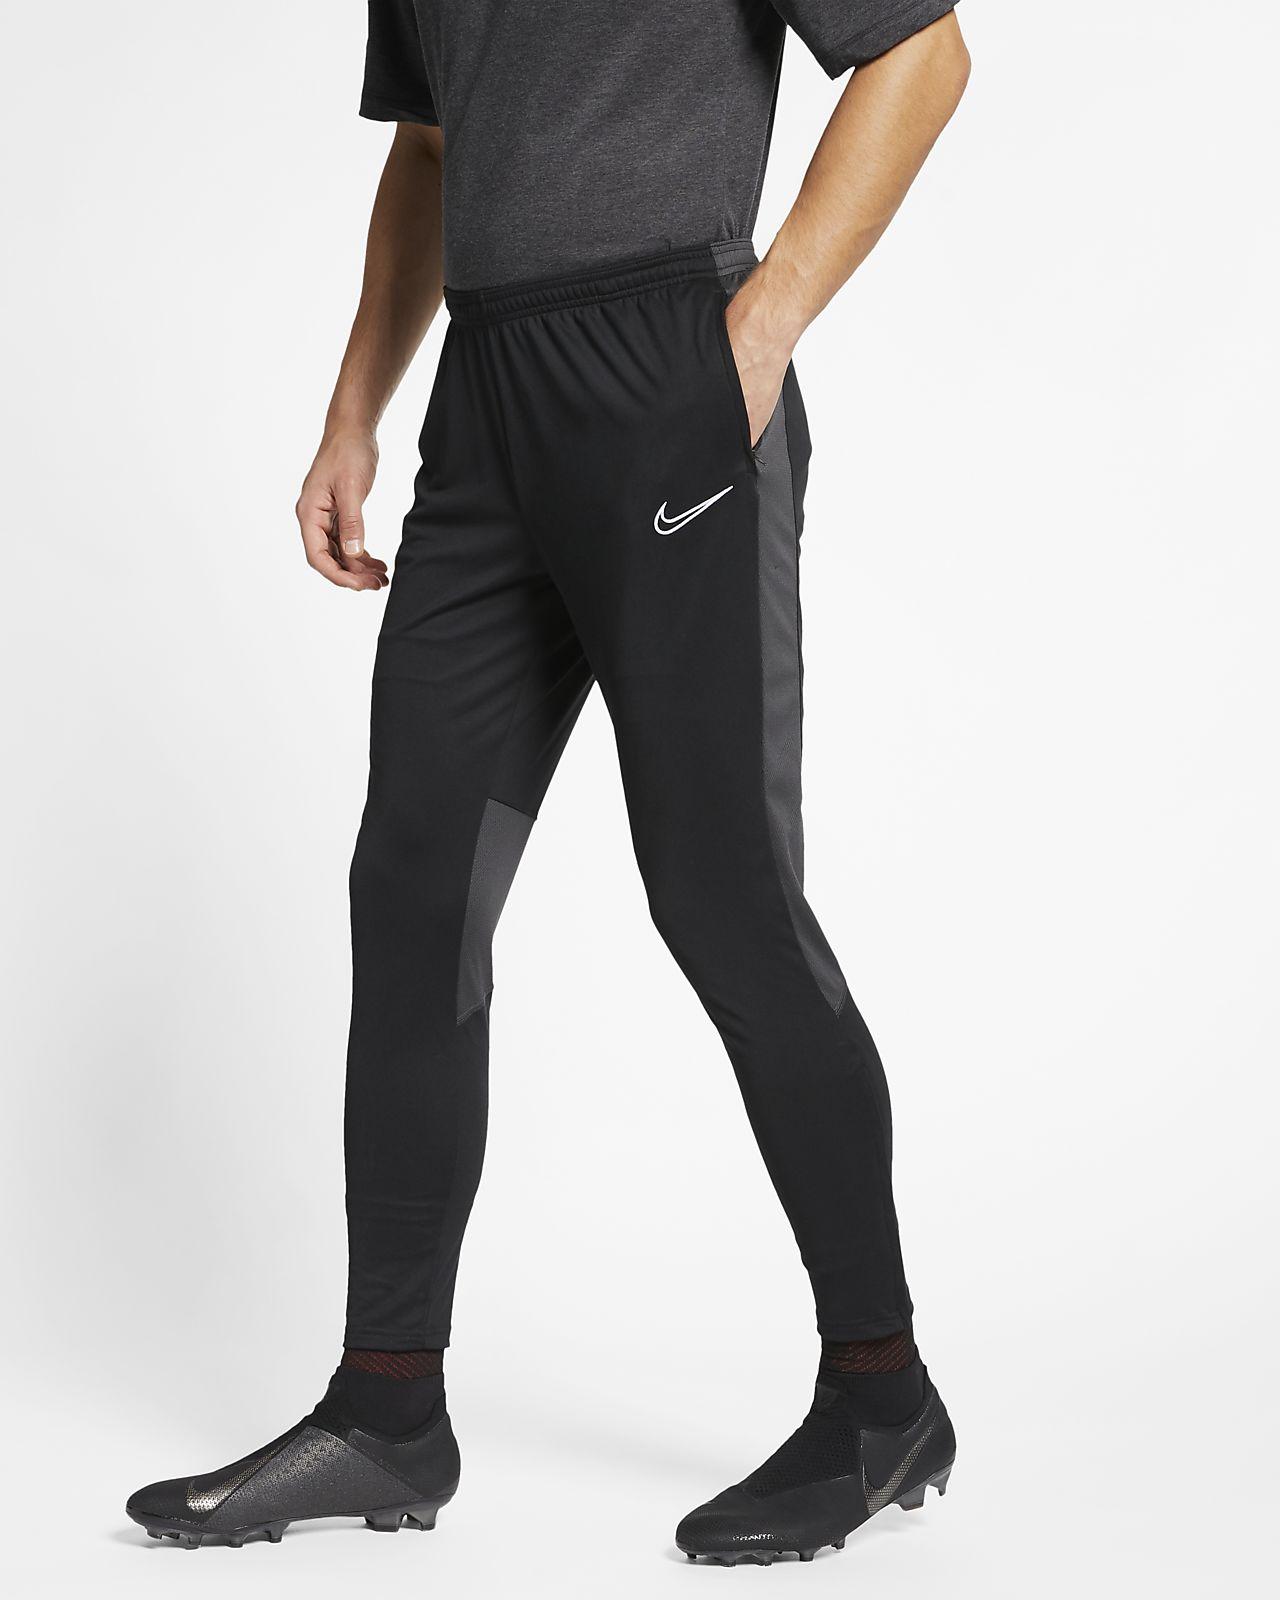 57723562ef5d Nike Dri-FIT Academy Men s Soccer Pants. Nike.com